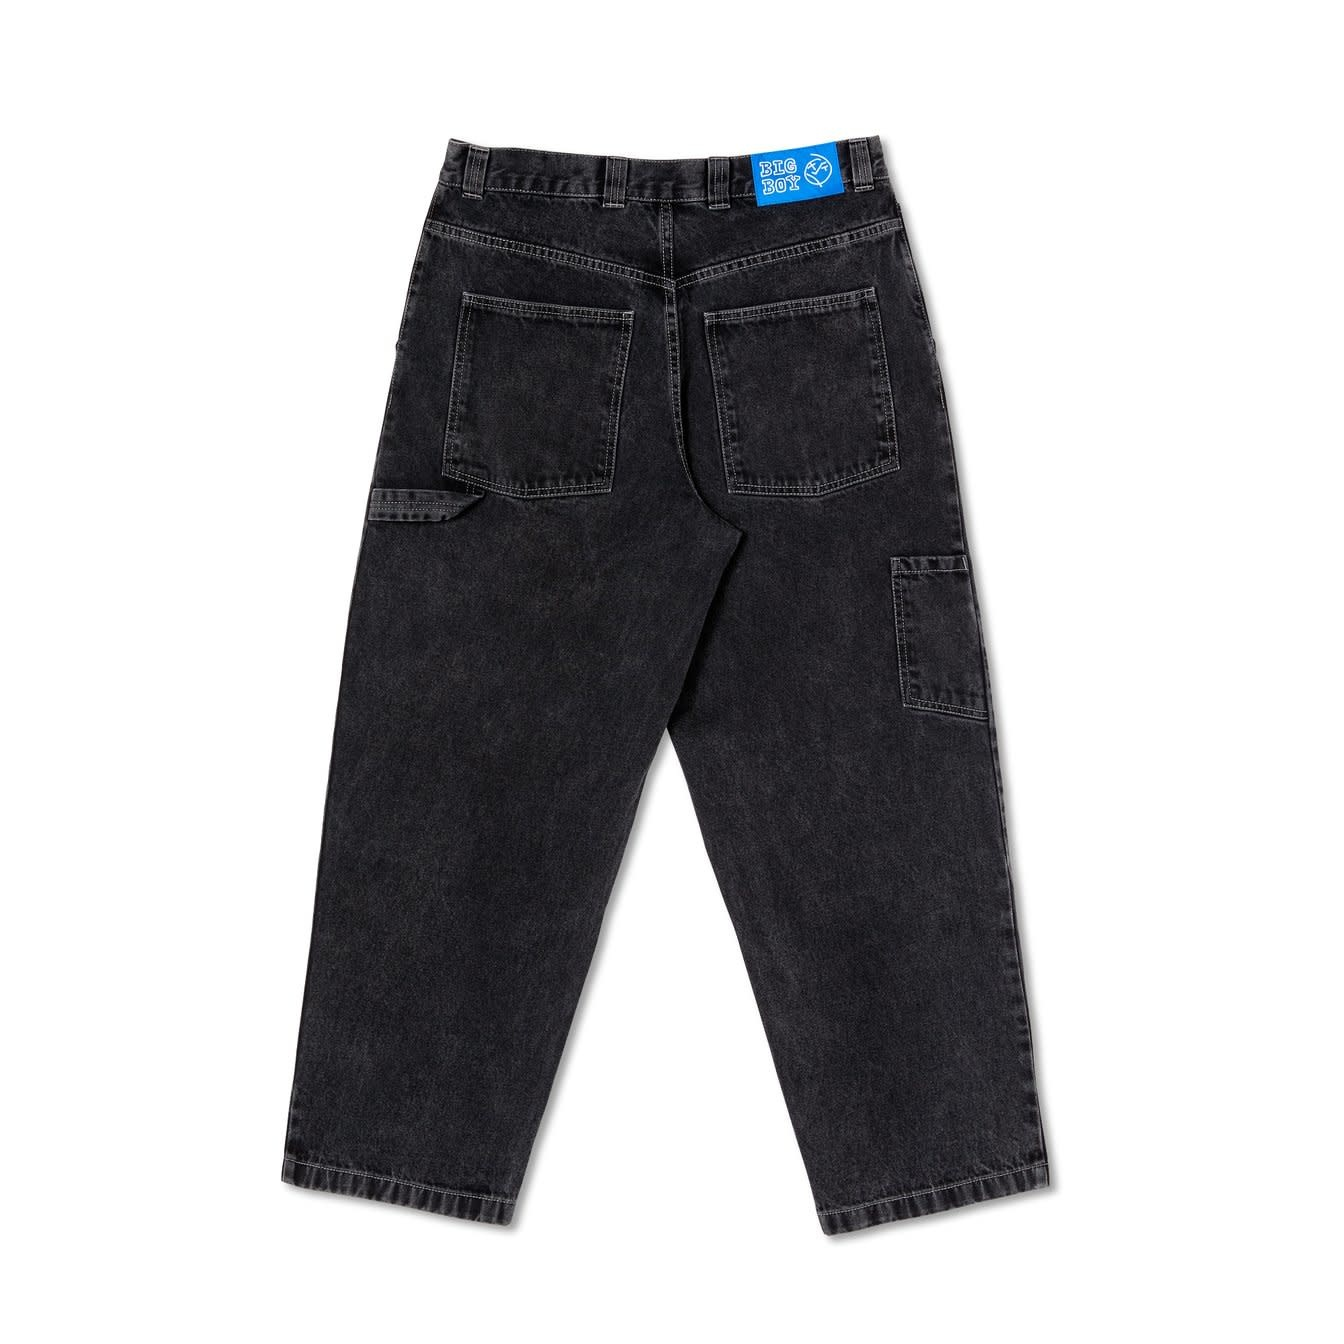 Polar Skate Co. Big Boy Work Pants Washed Black